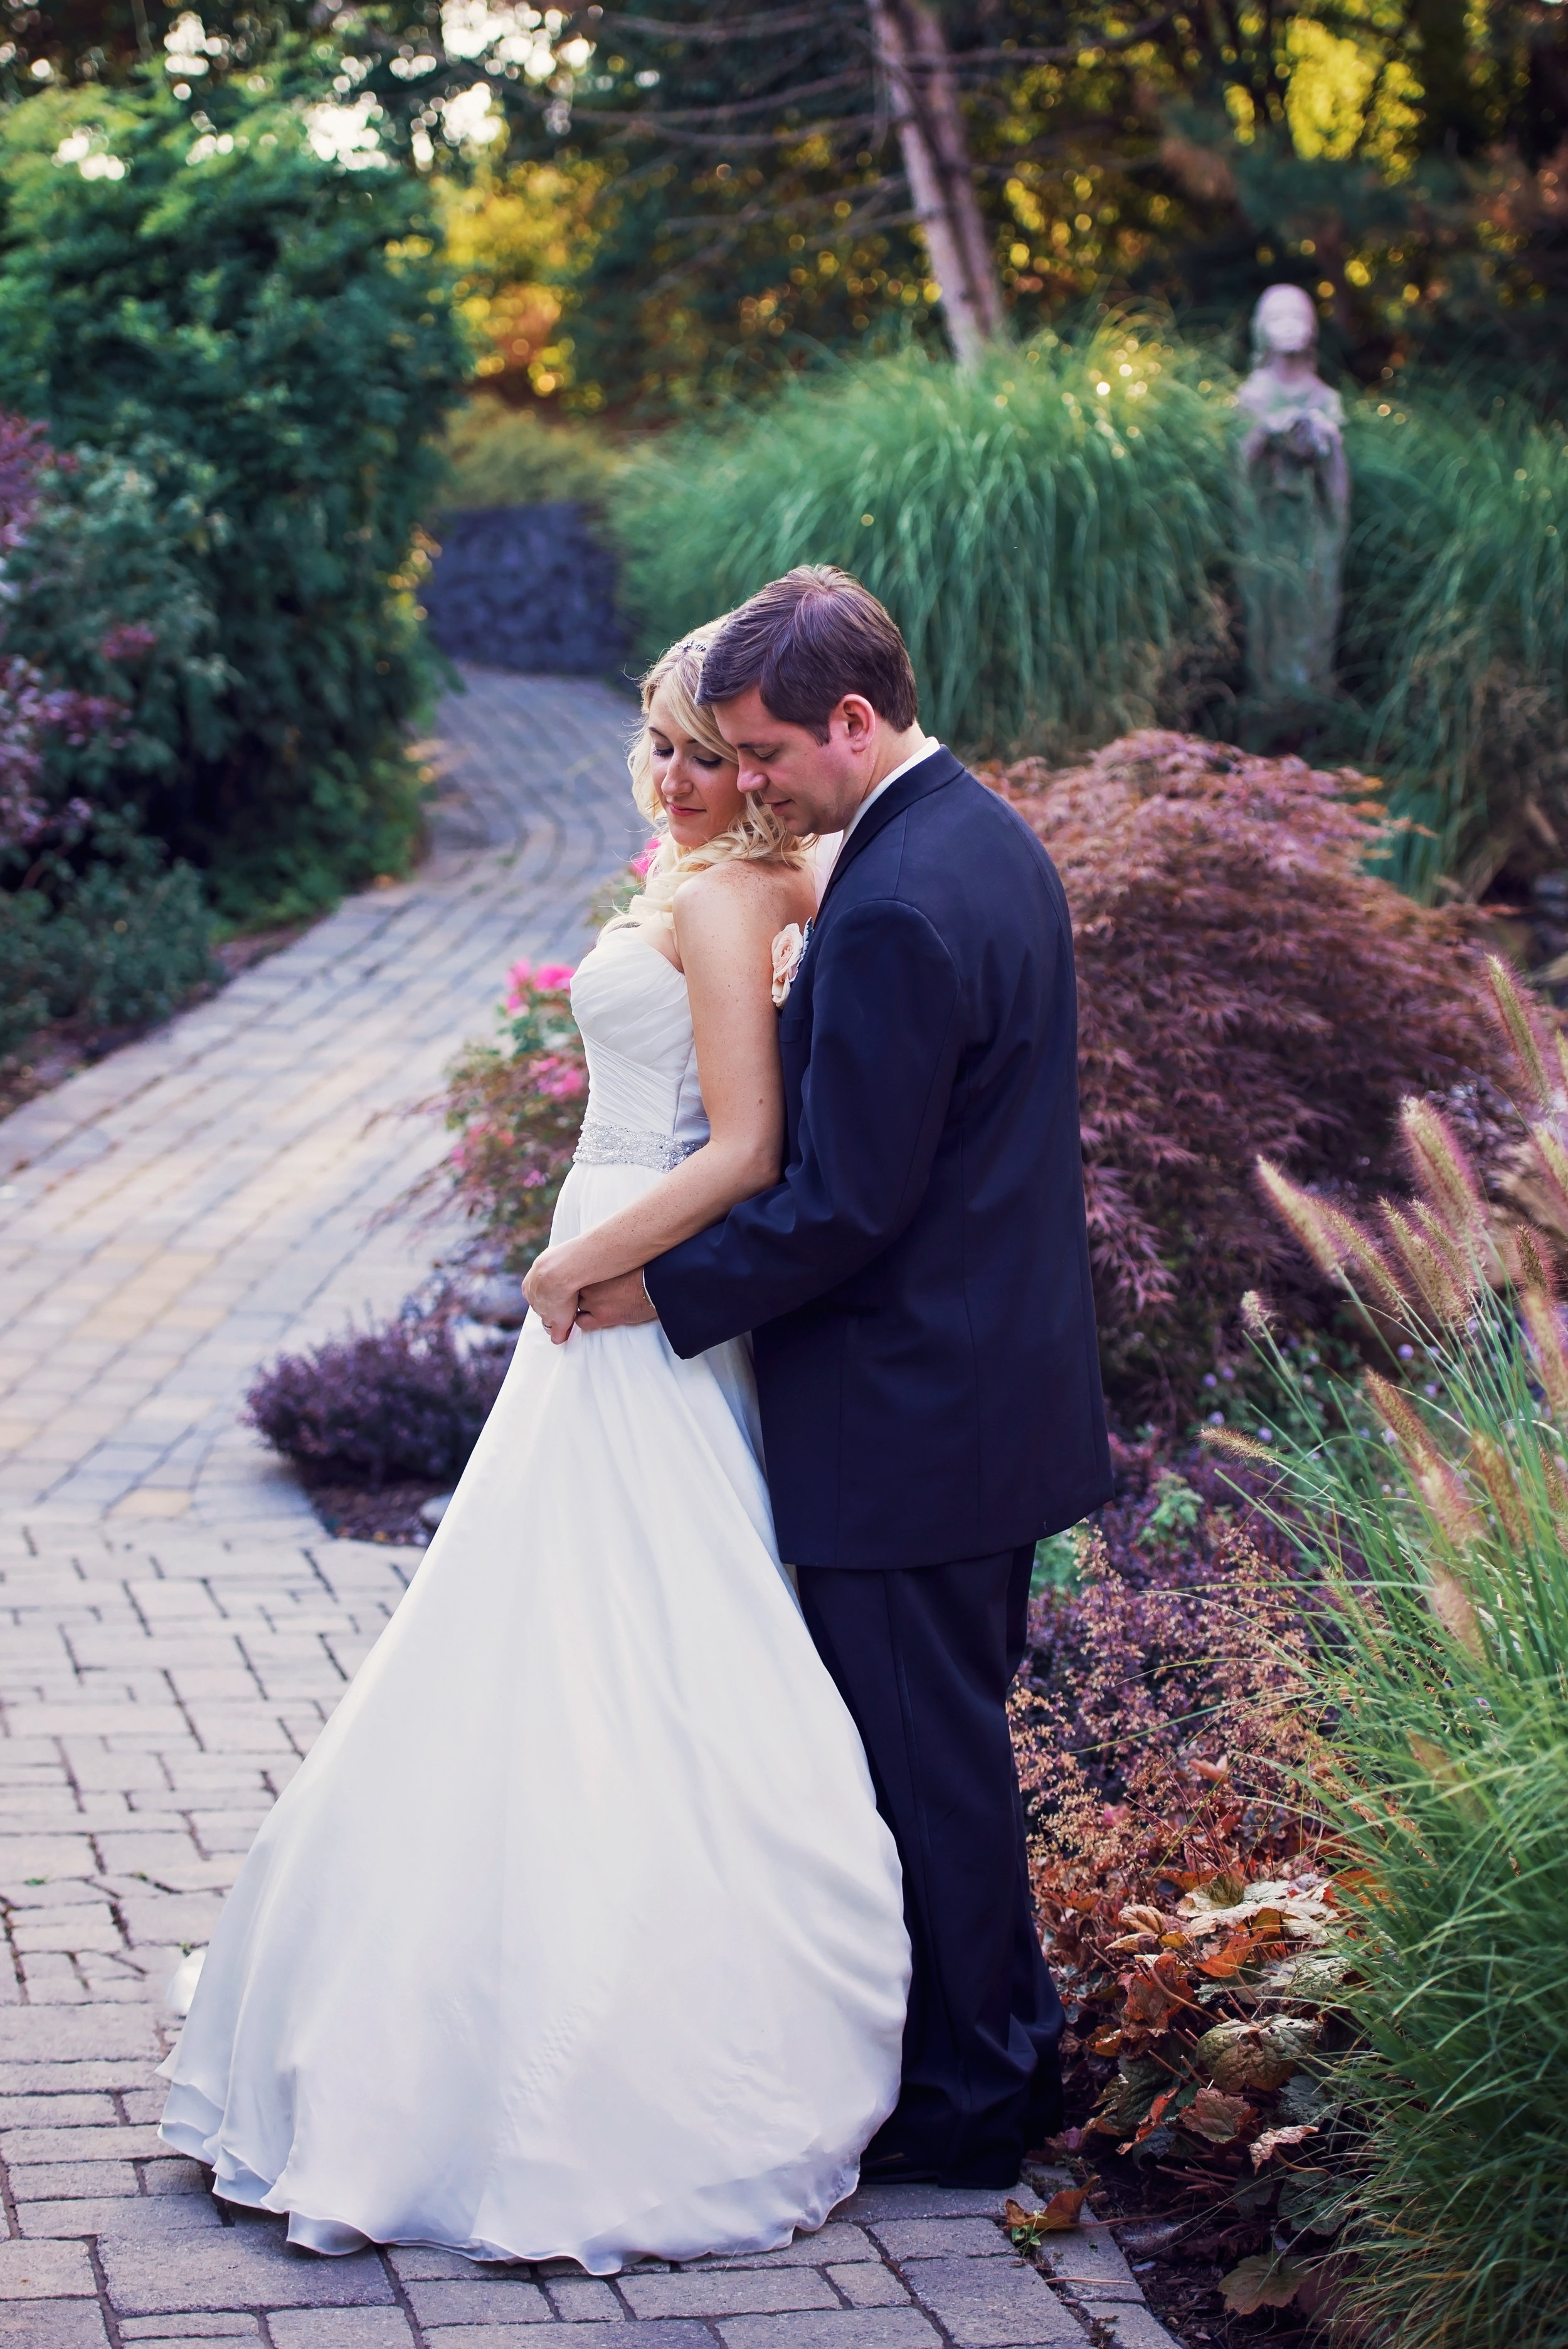 Wedding First Look Photos00948.jpg